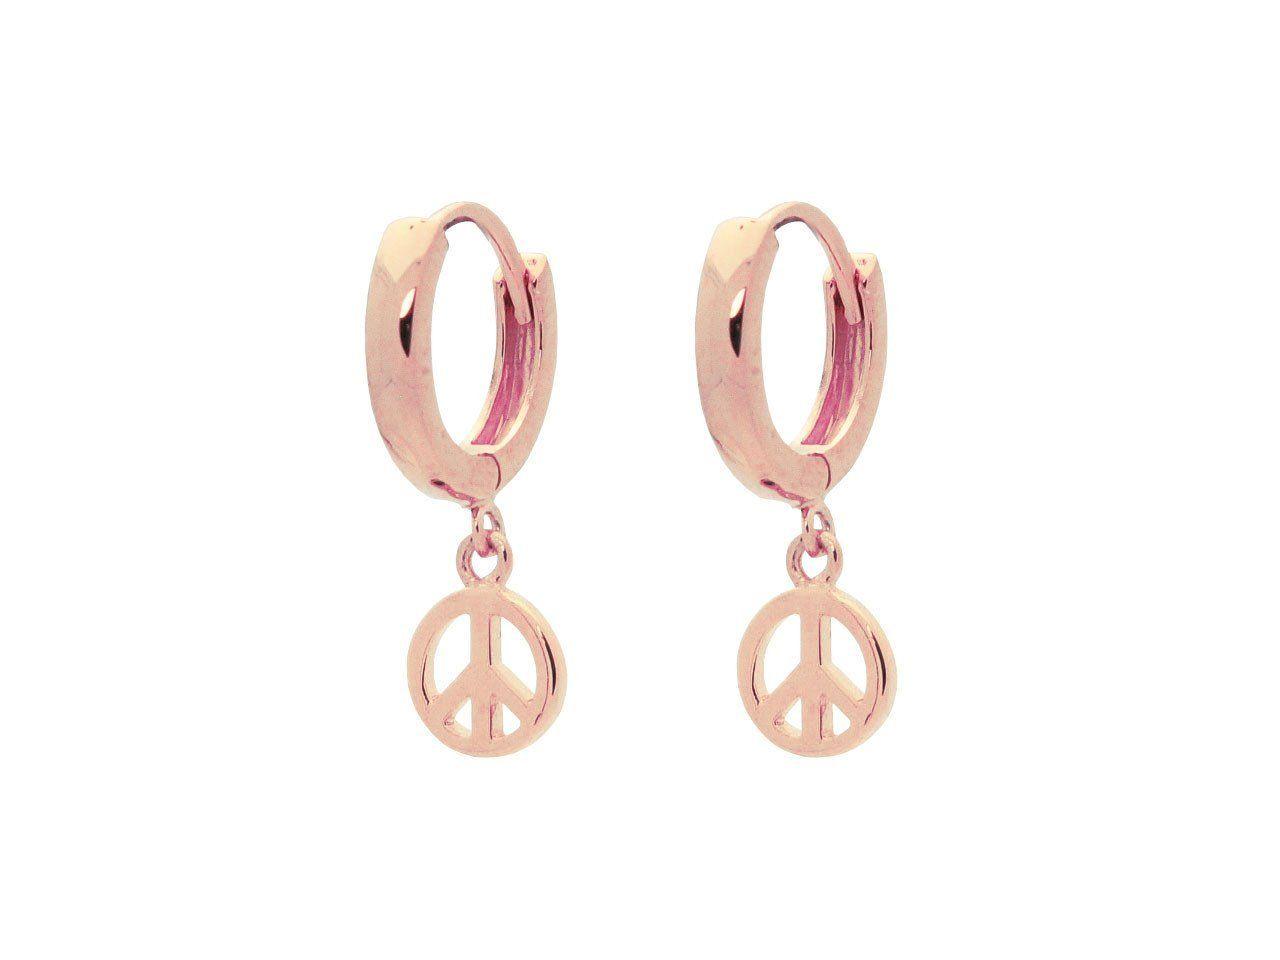 Mini Huggie Girls Earrings Peace Sign| Beckids Jewelry for Kids ...